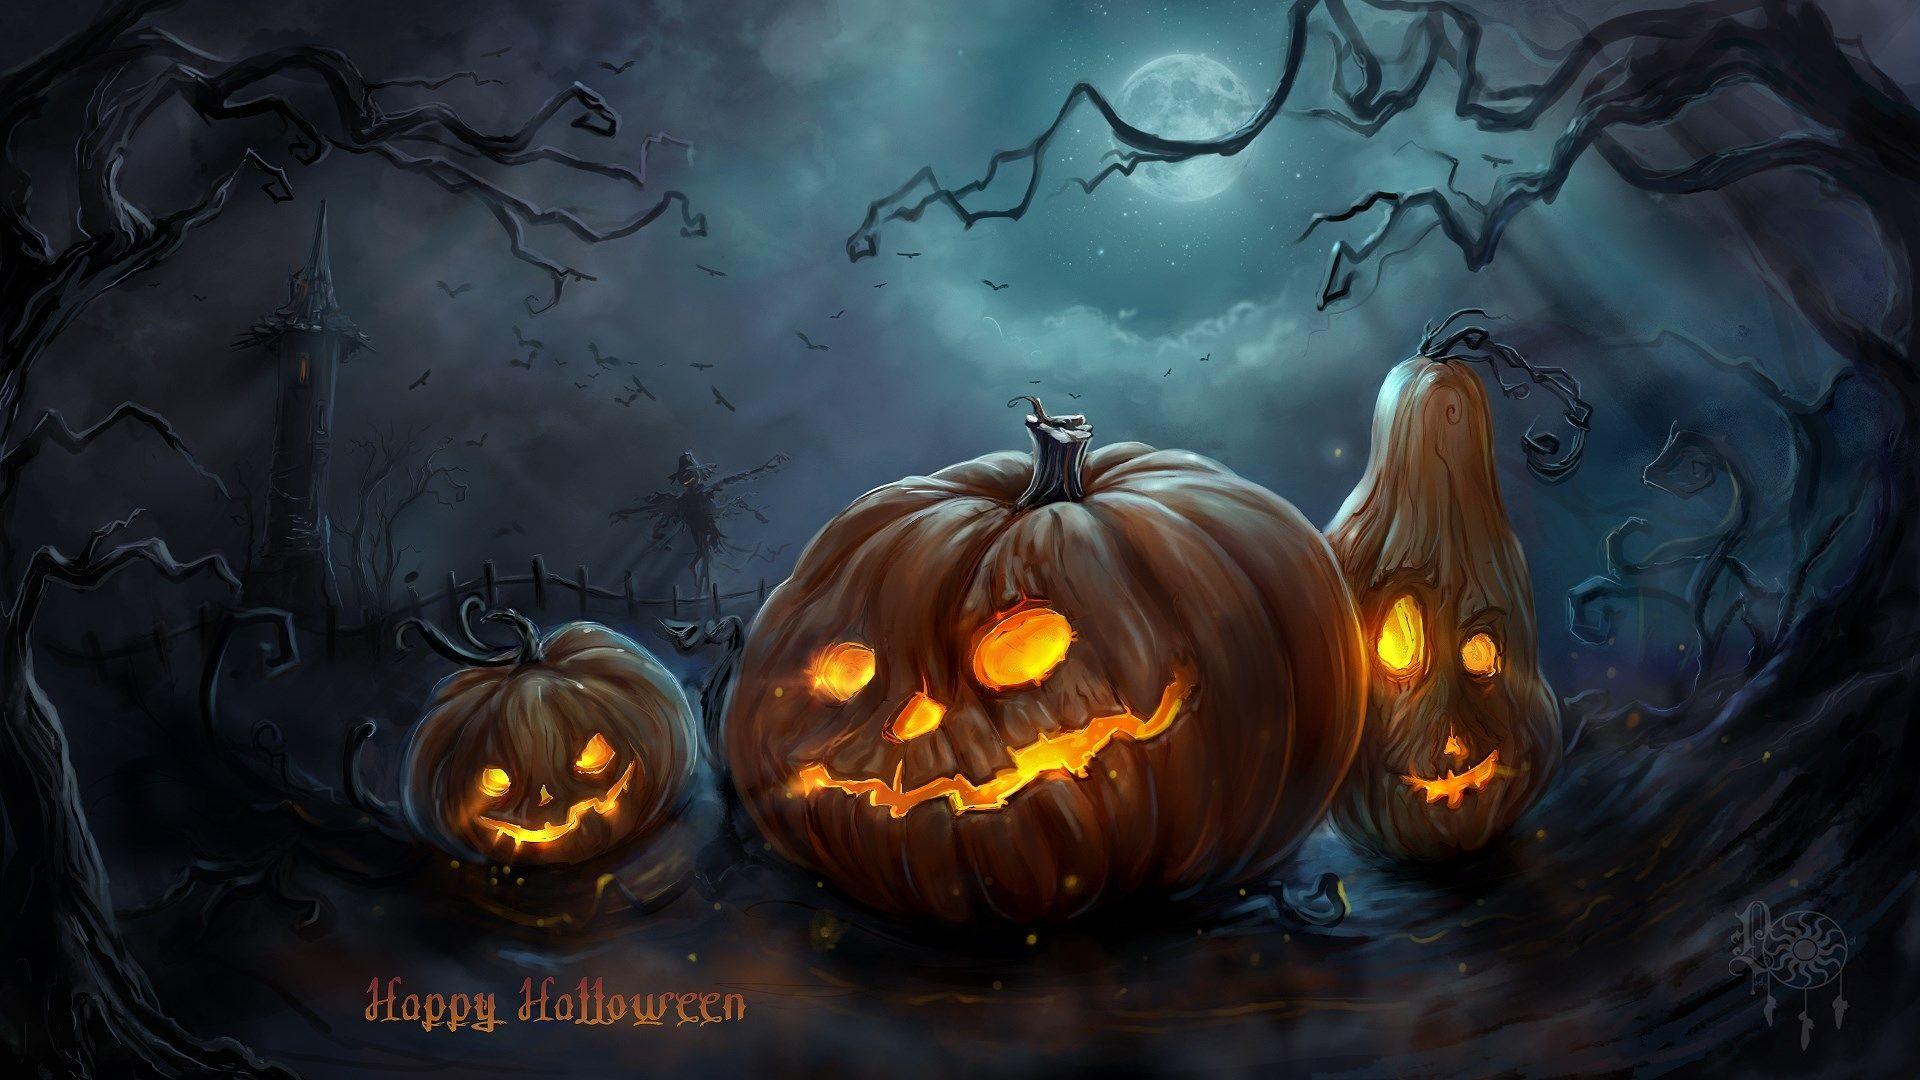 Halloween Wallpapers Widescreen For Widescreen Wallpaper